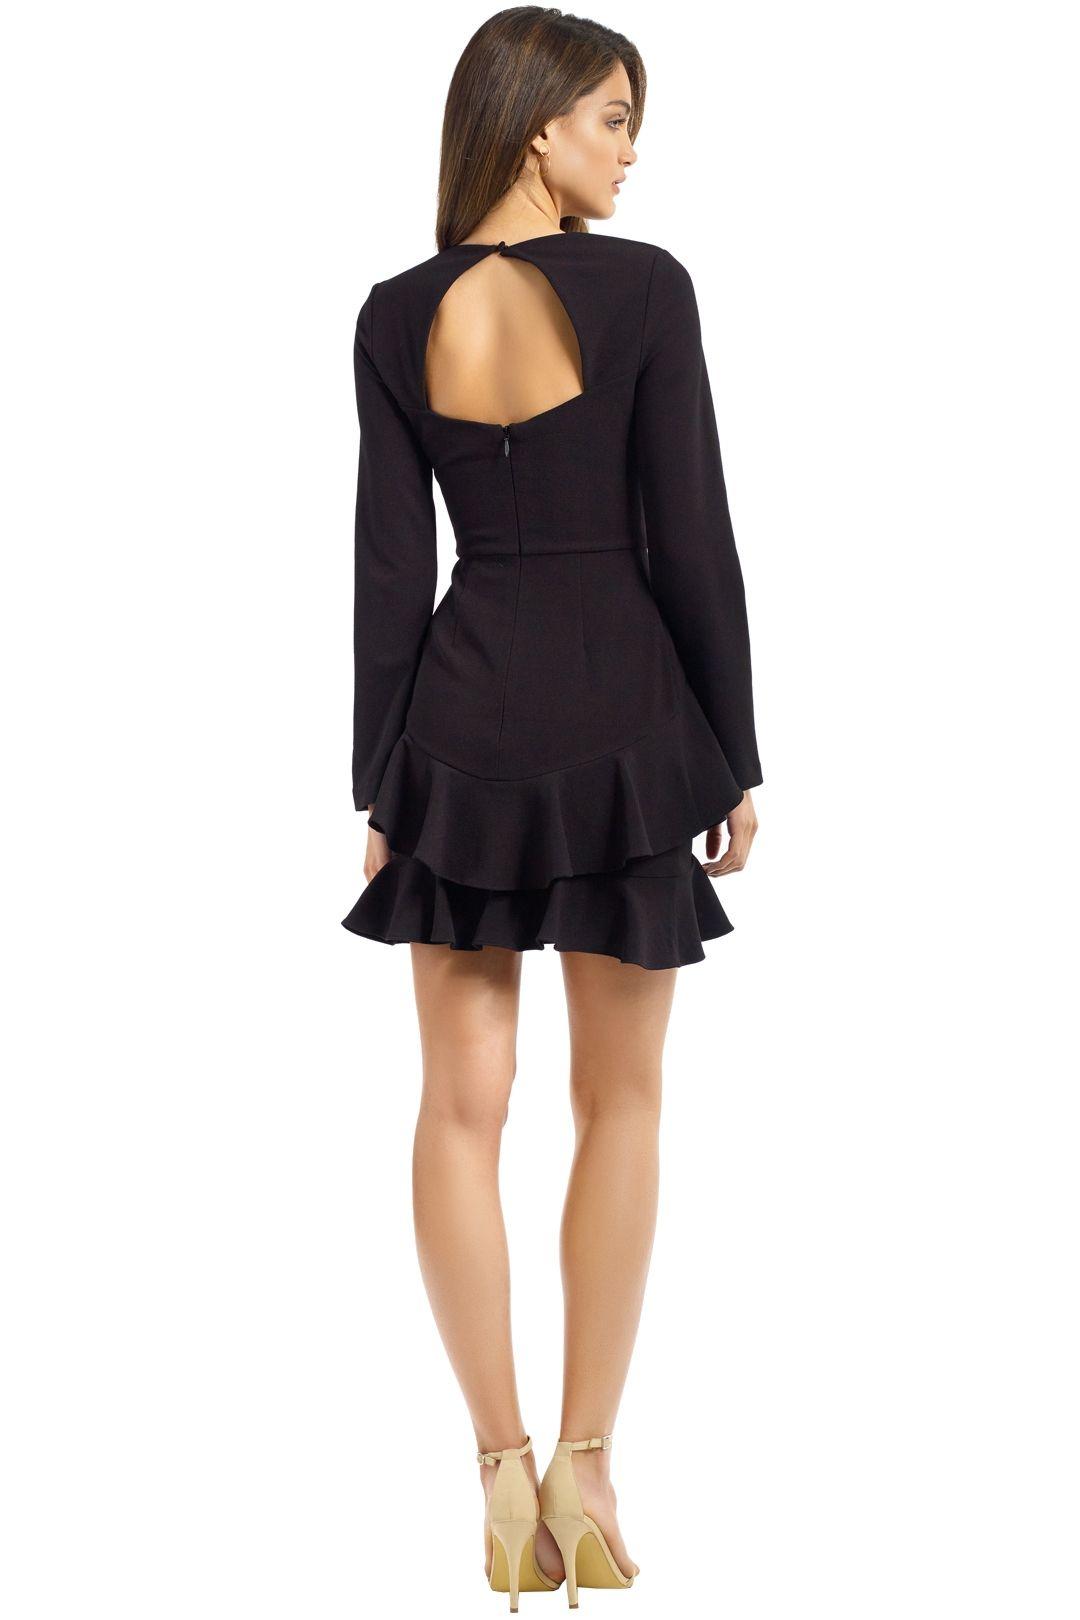 Rebecca Vallance - Havana LS Mini Dress - Black - Back